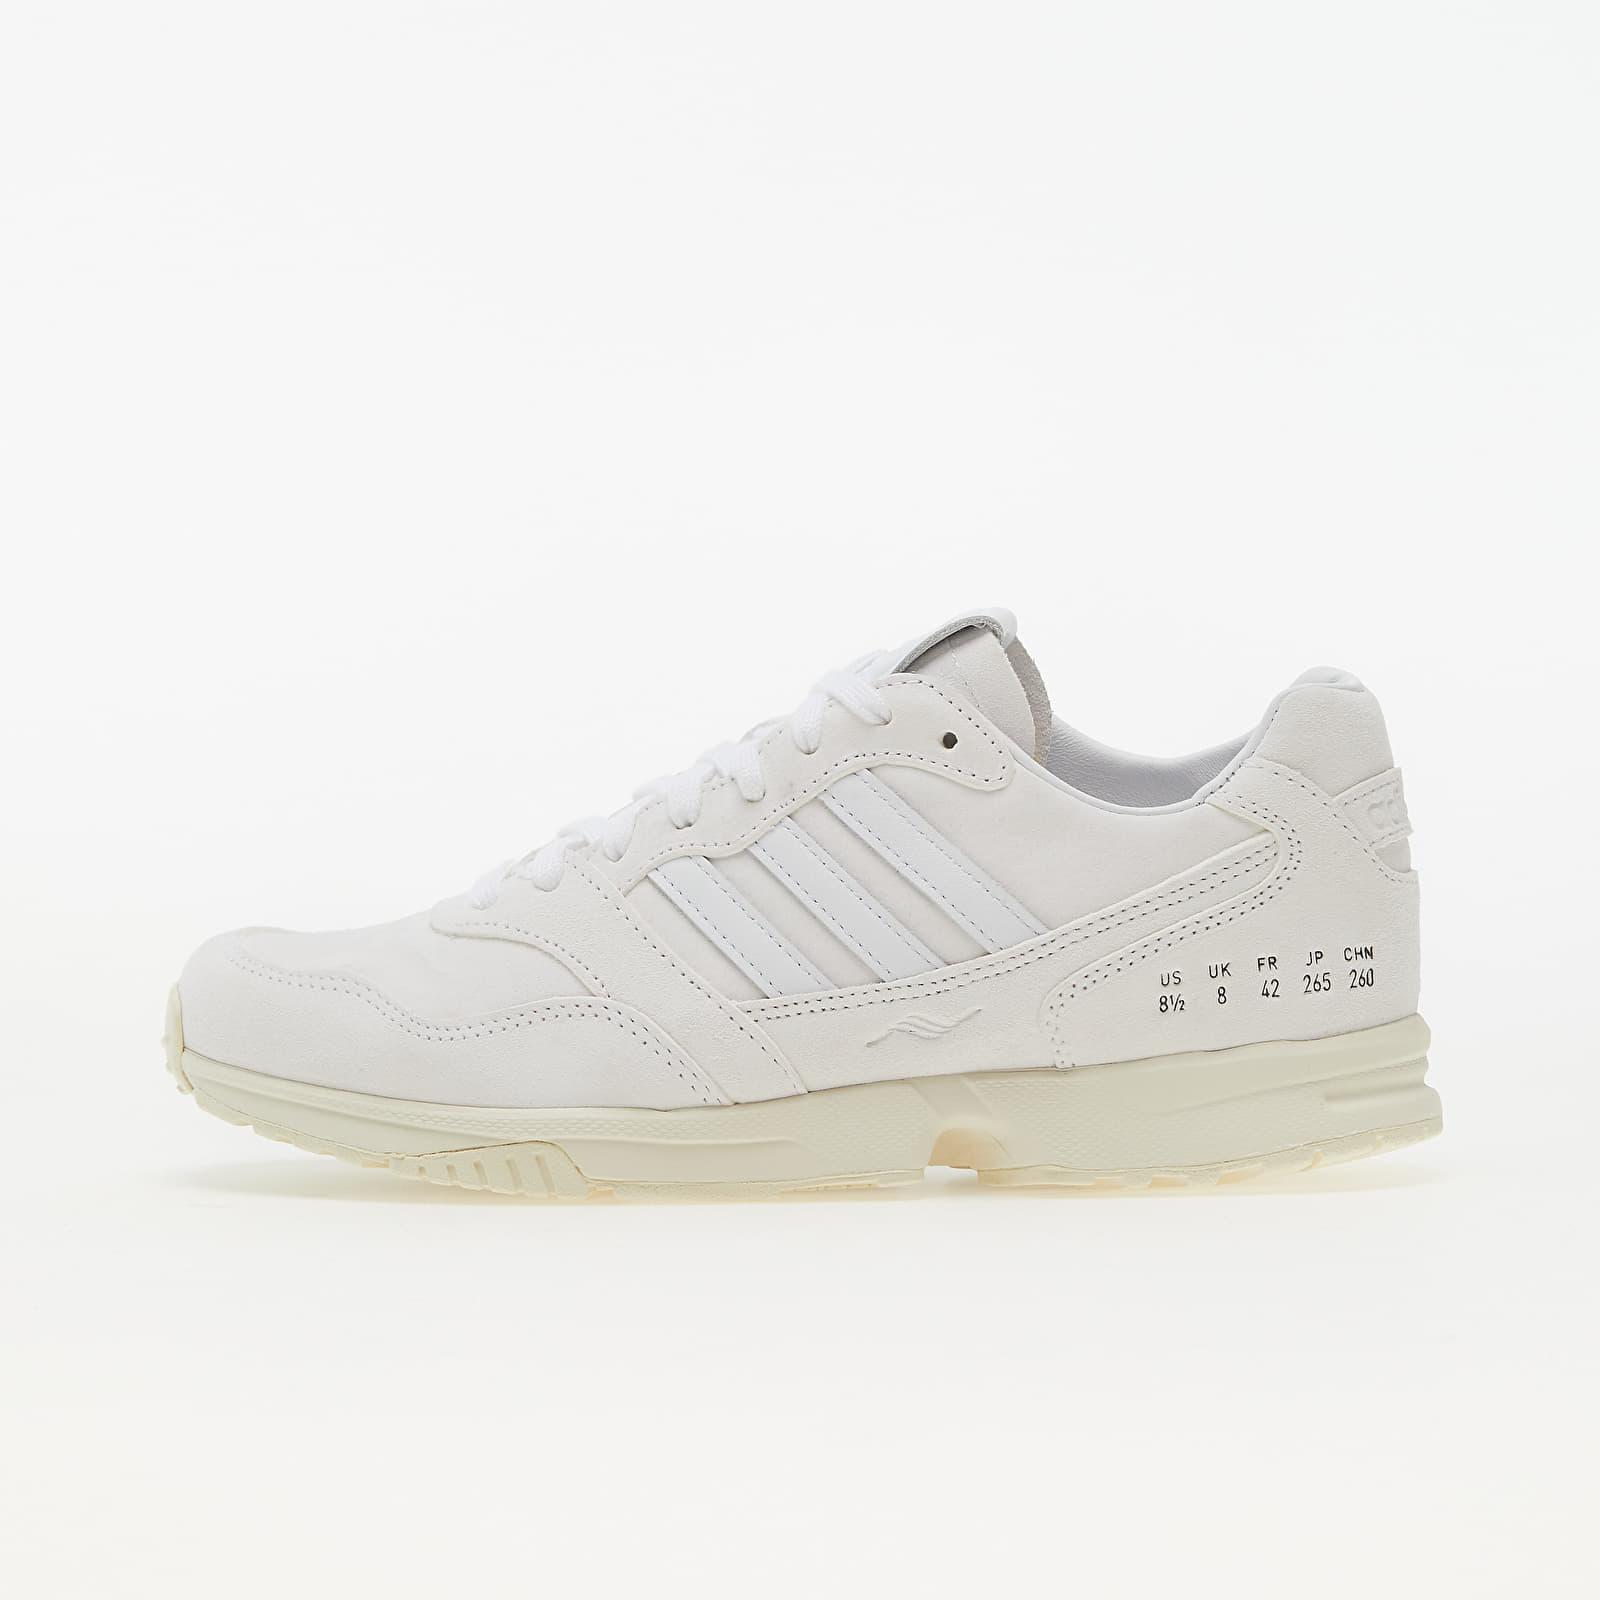 adidas ZX 1000 C Supplier Color/ Ftw White/ Off White EUR 46